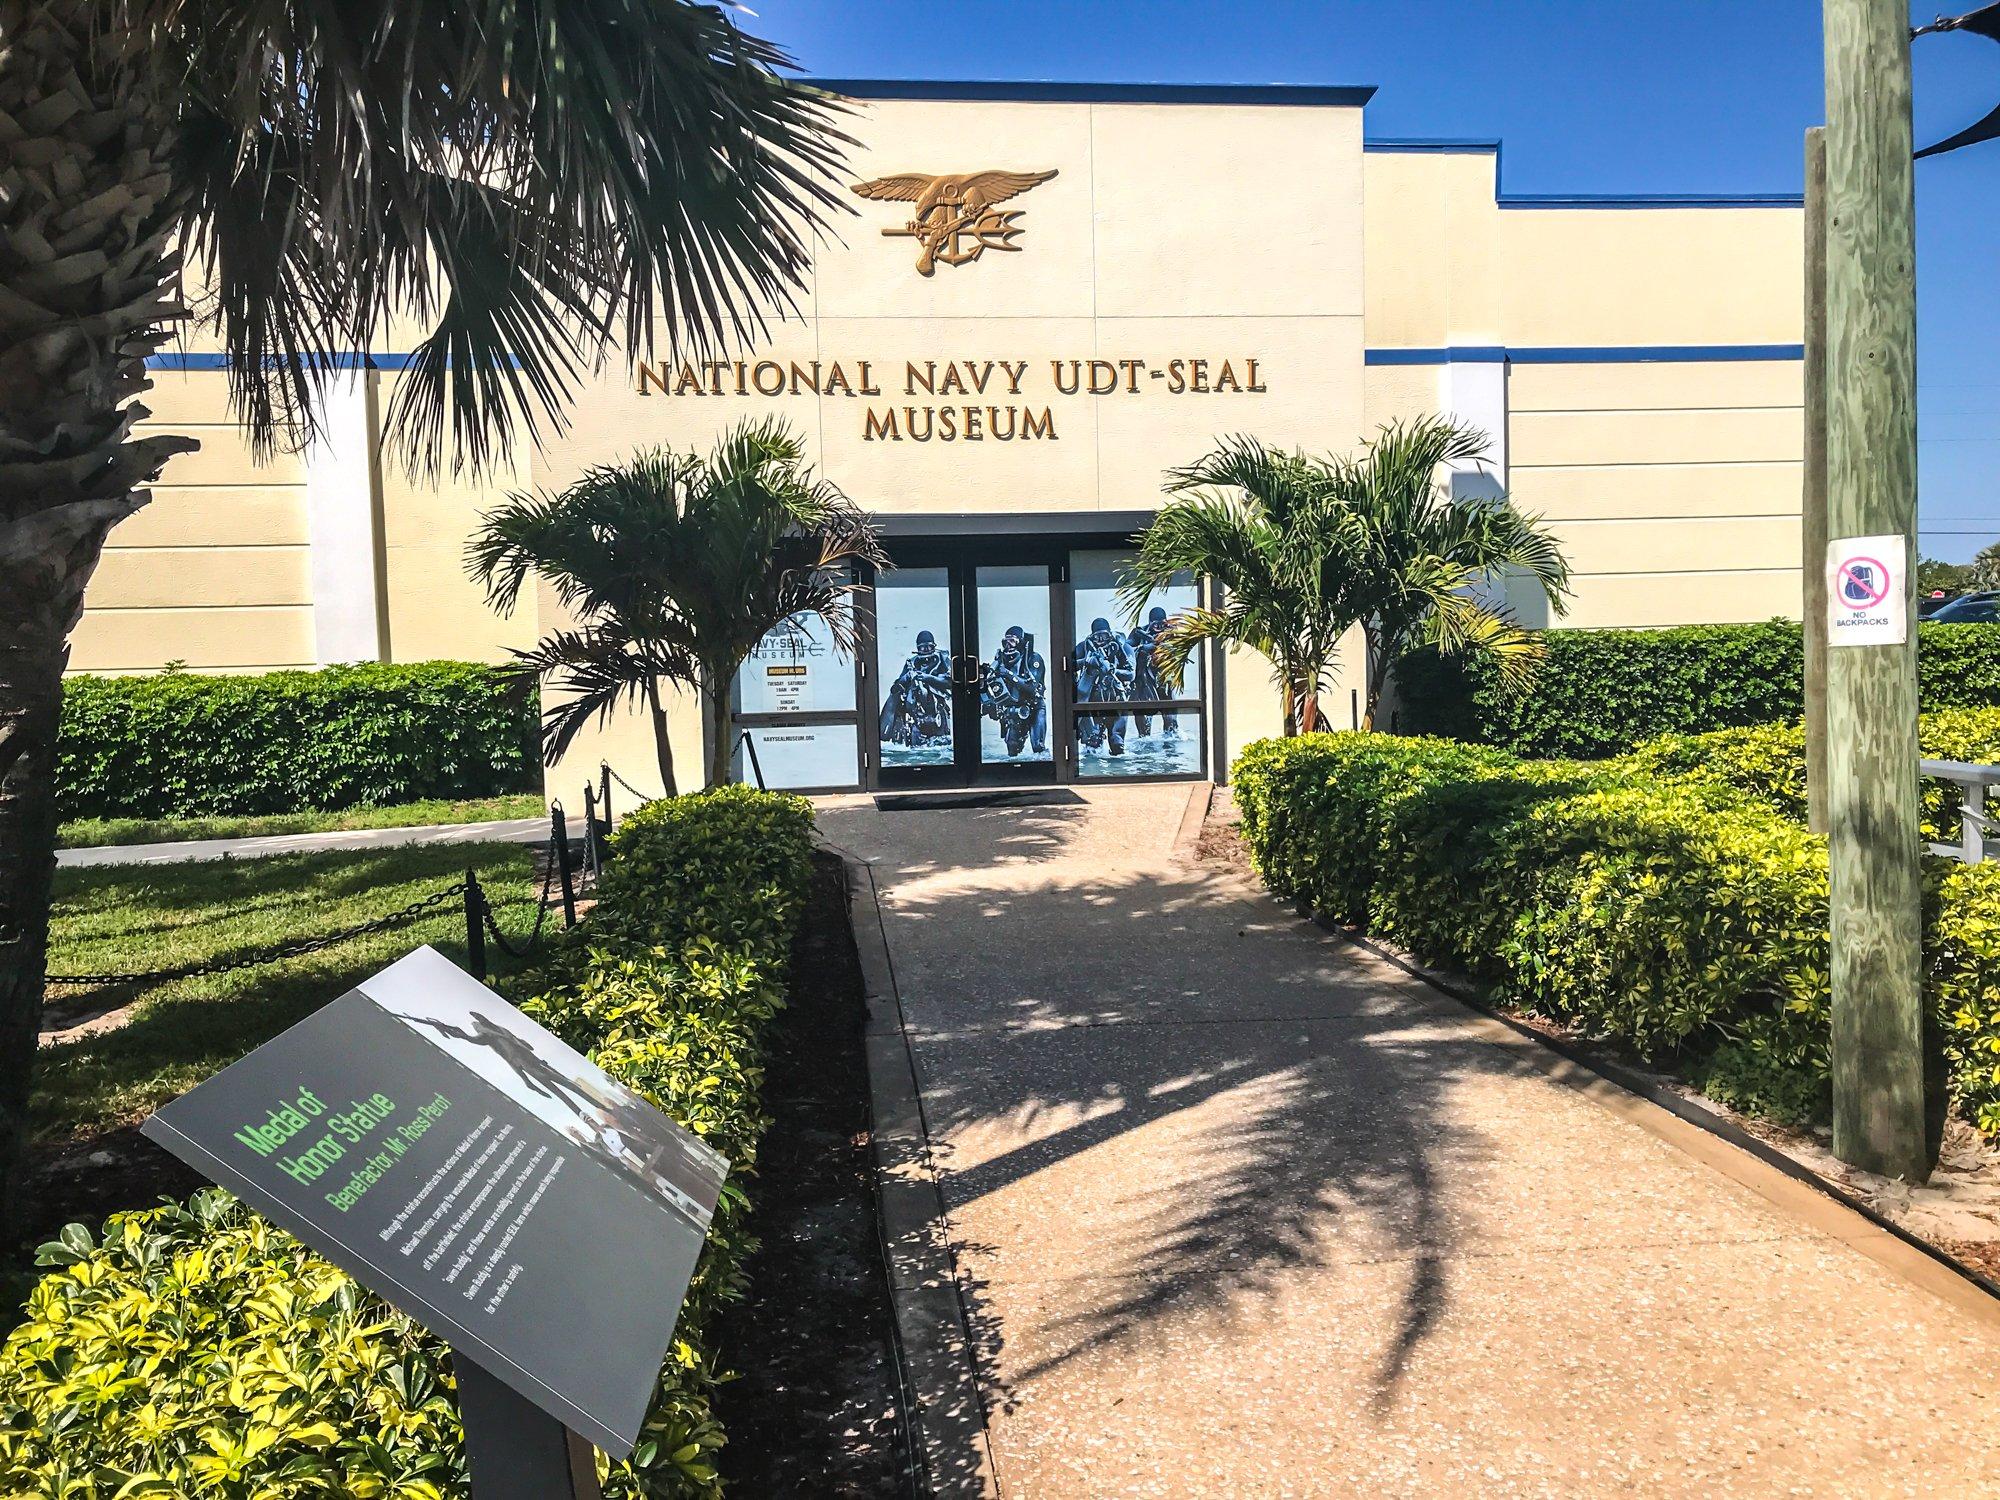 Navy SEAL museum in Fort Pierce Florida